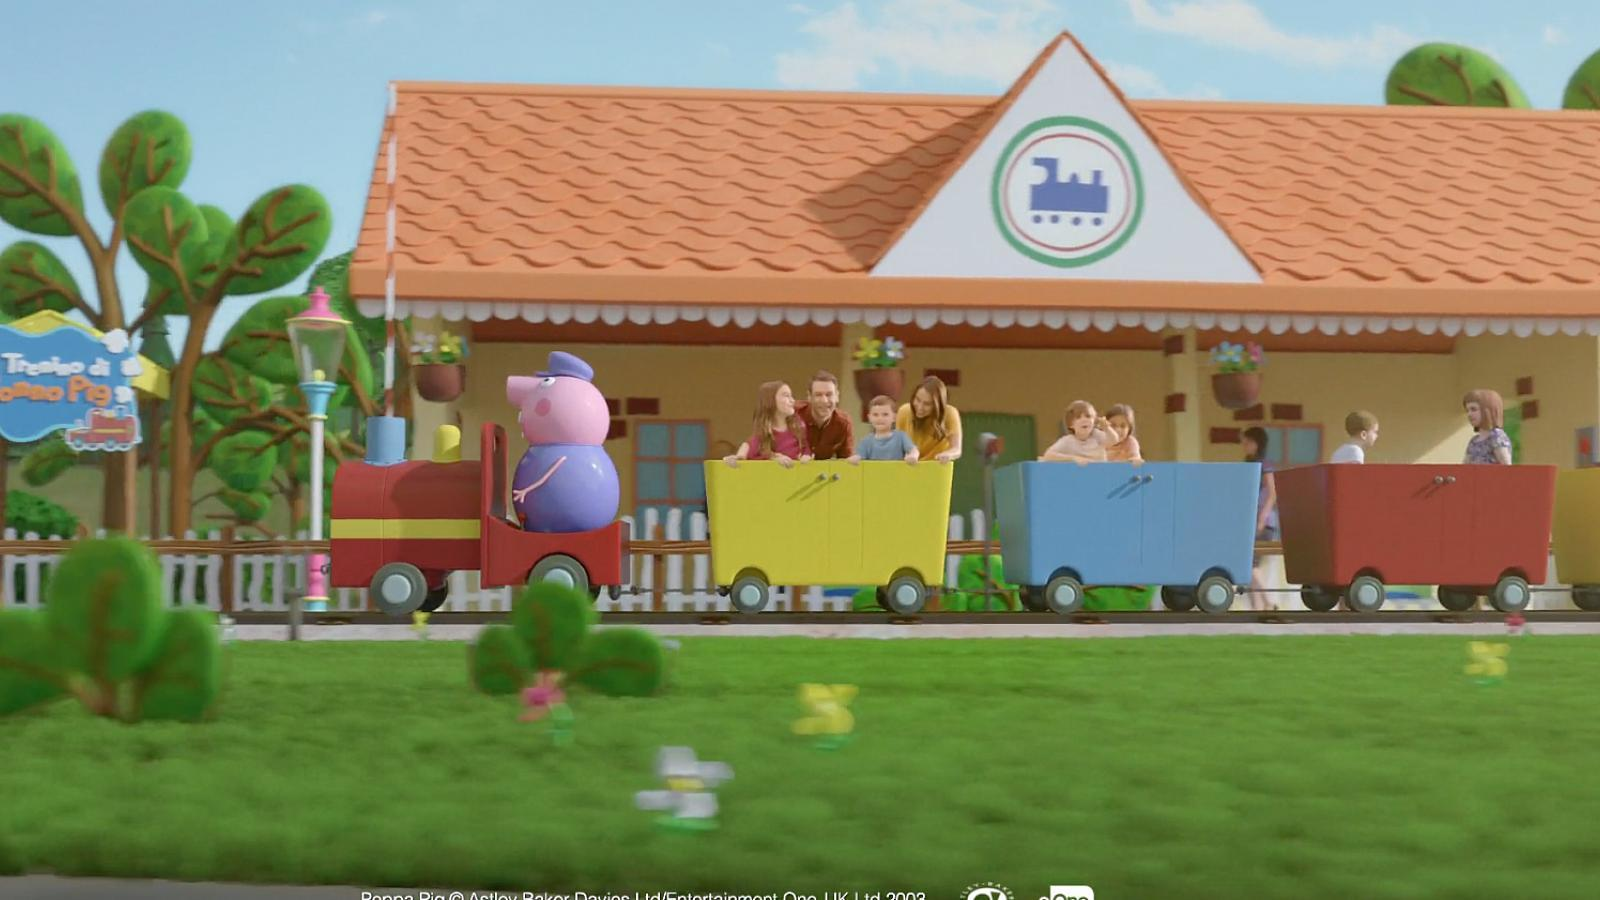 TBWA promotes Peppa Pig's Italian arrival